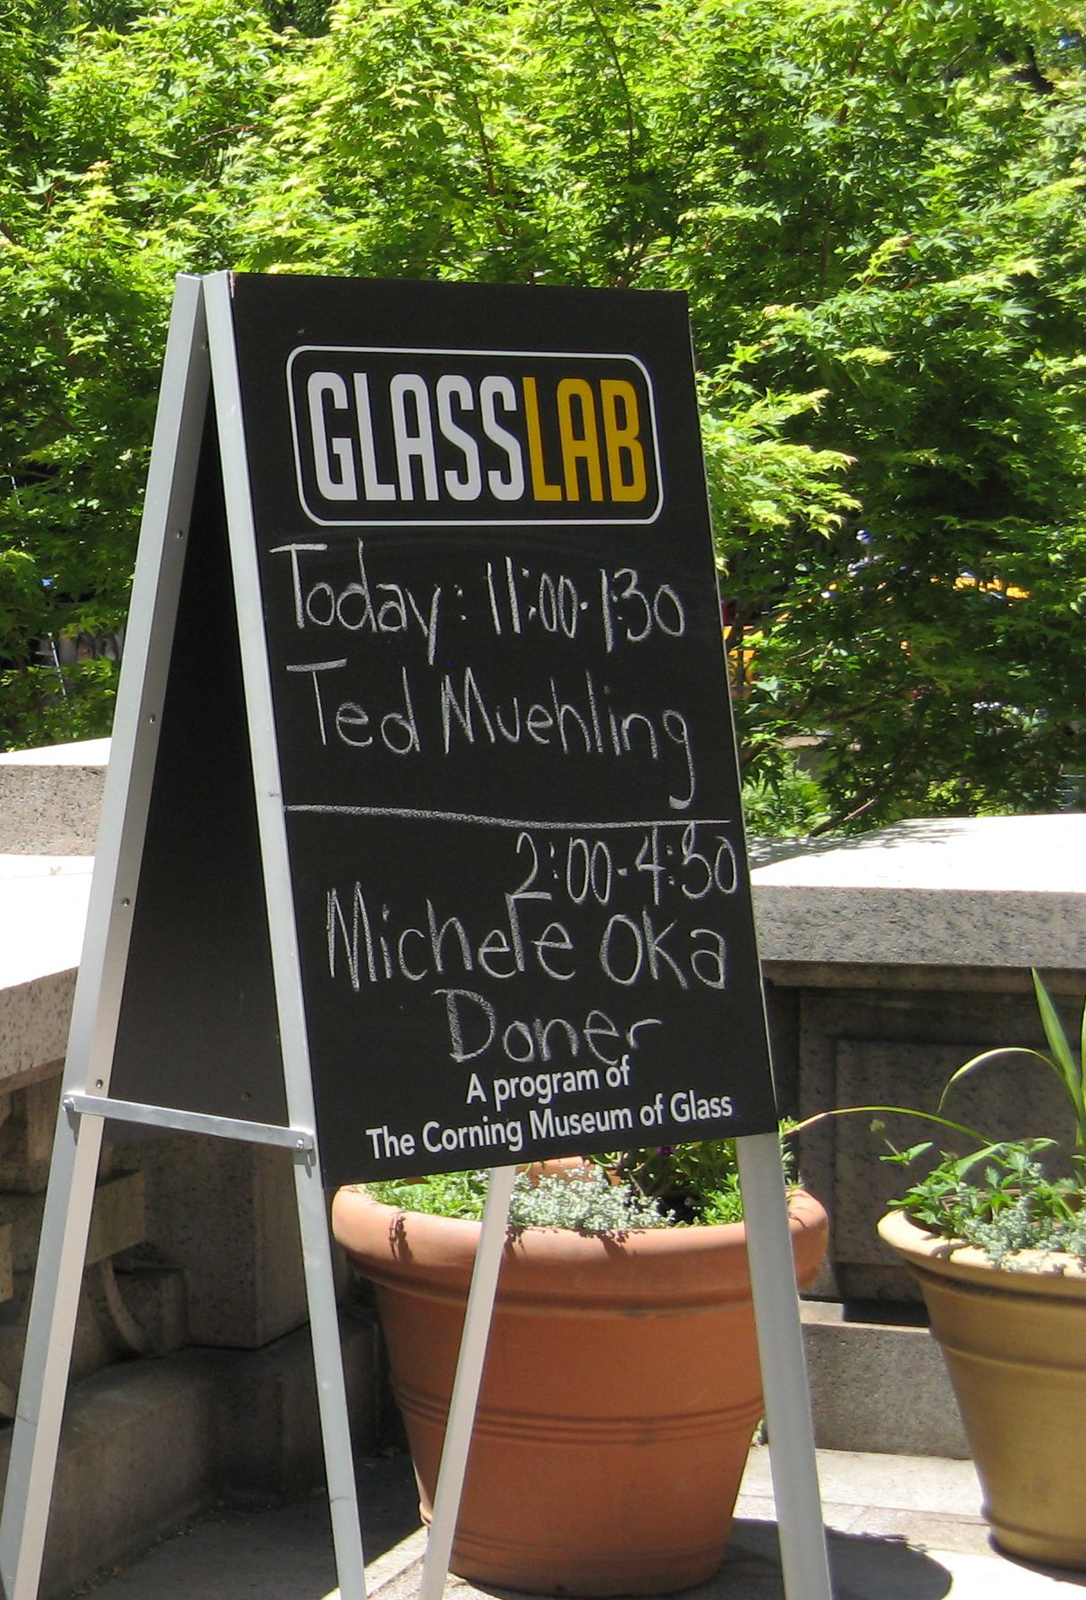 GlassLab at The Cooper Hewitt, National Design Museum